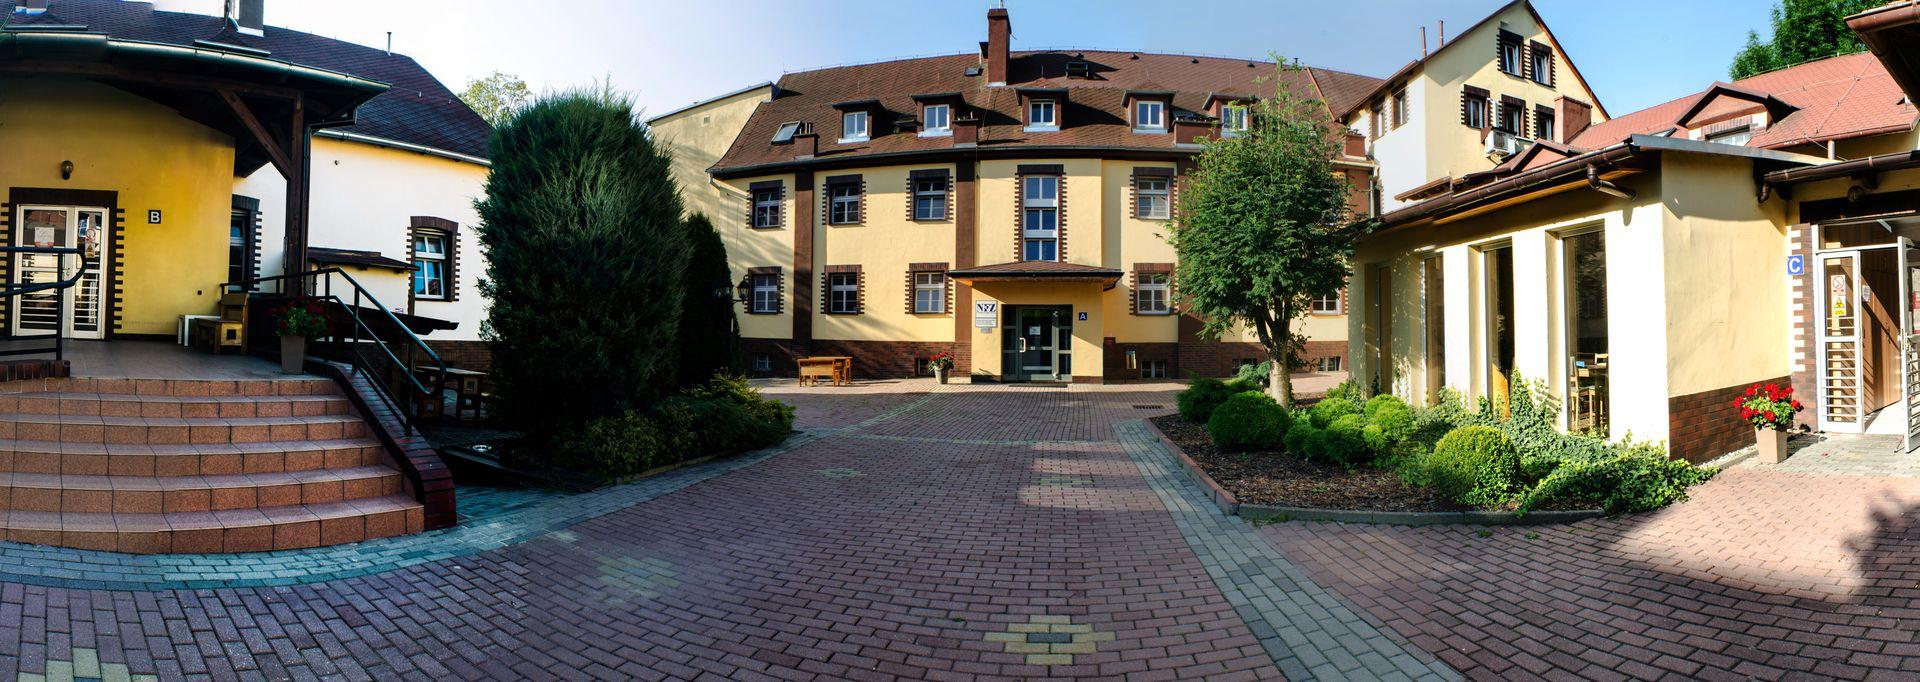 panorama_bedkowo_1